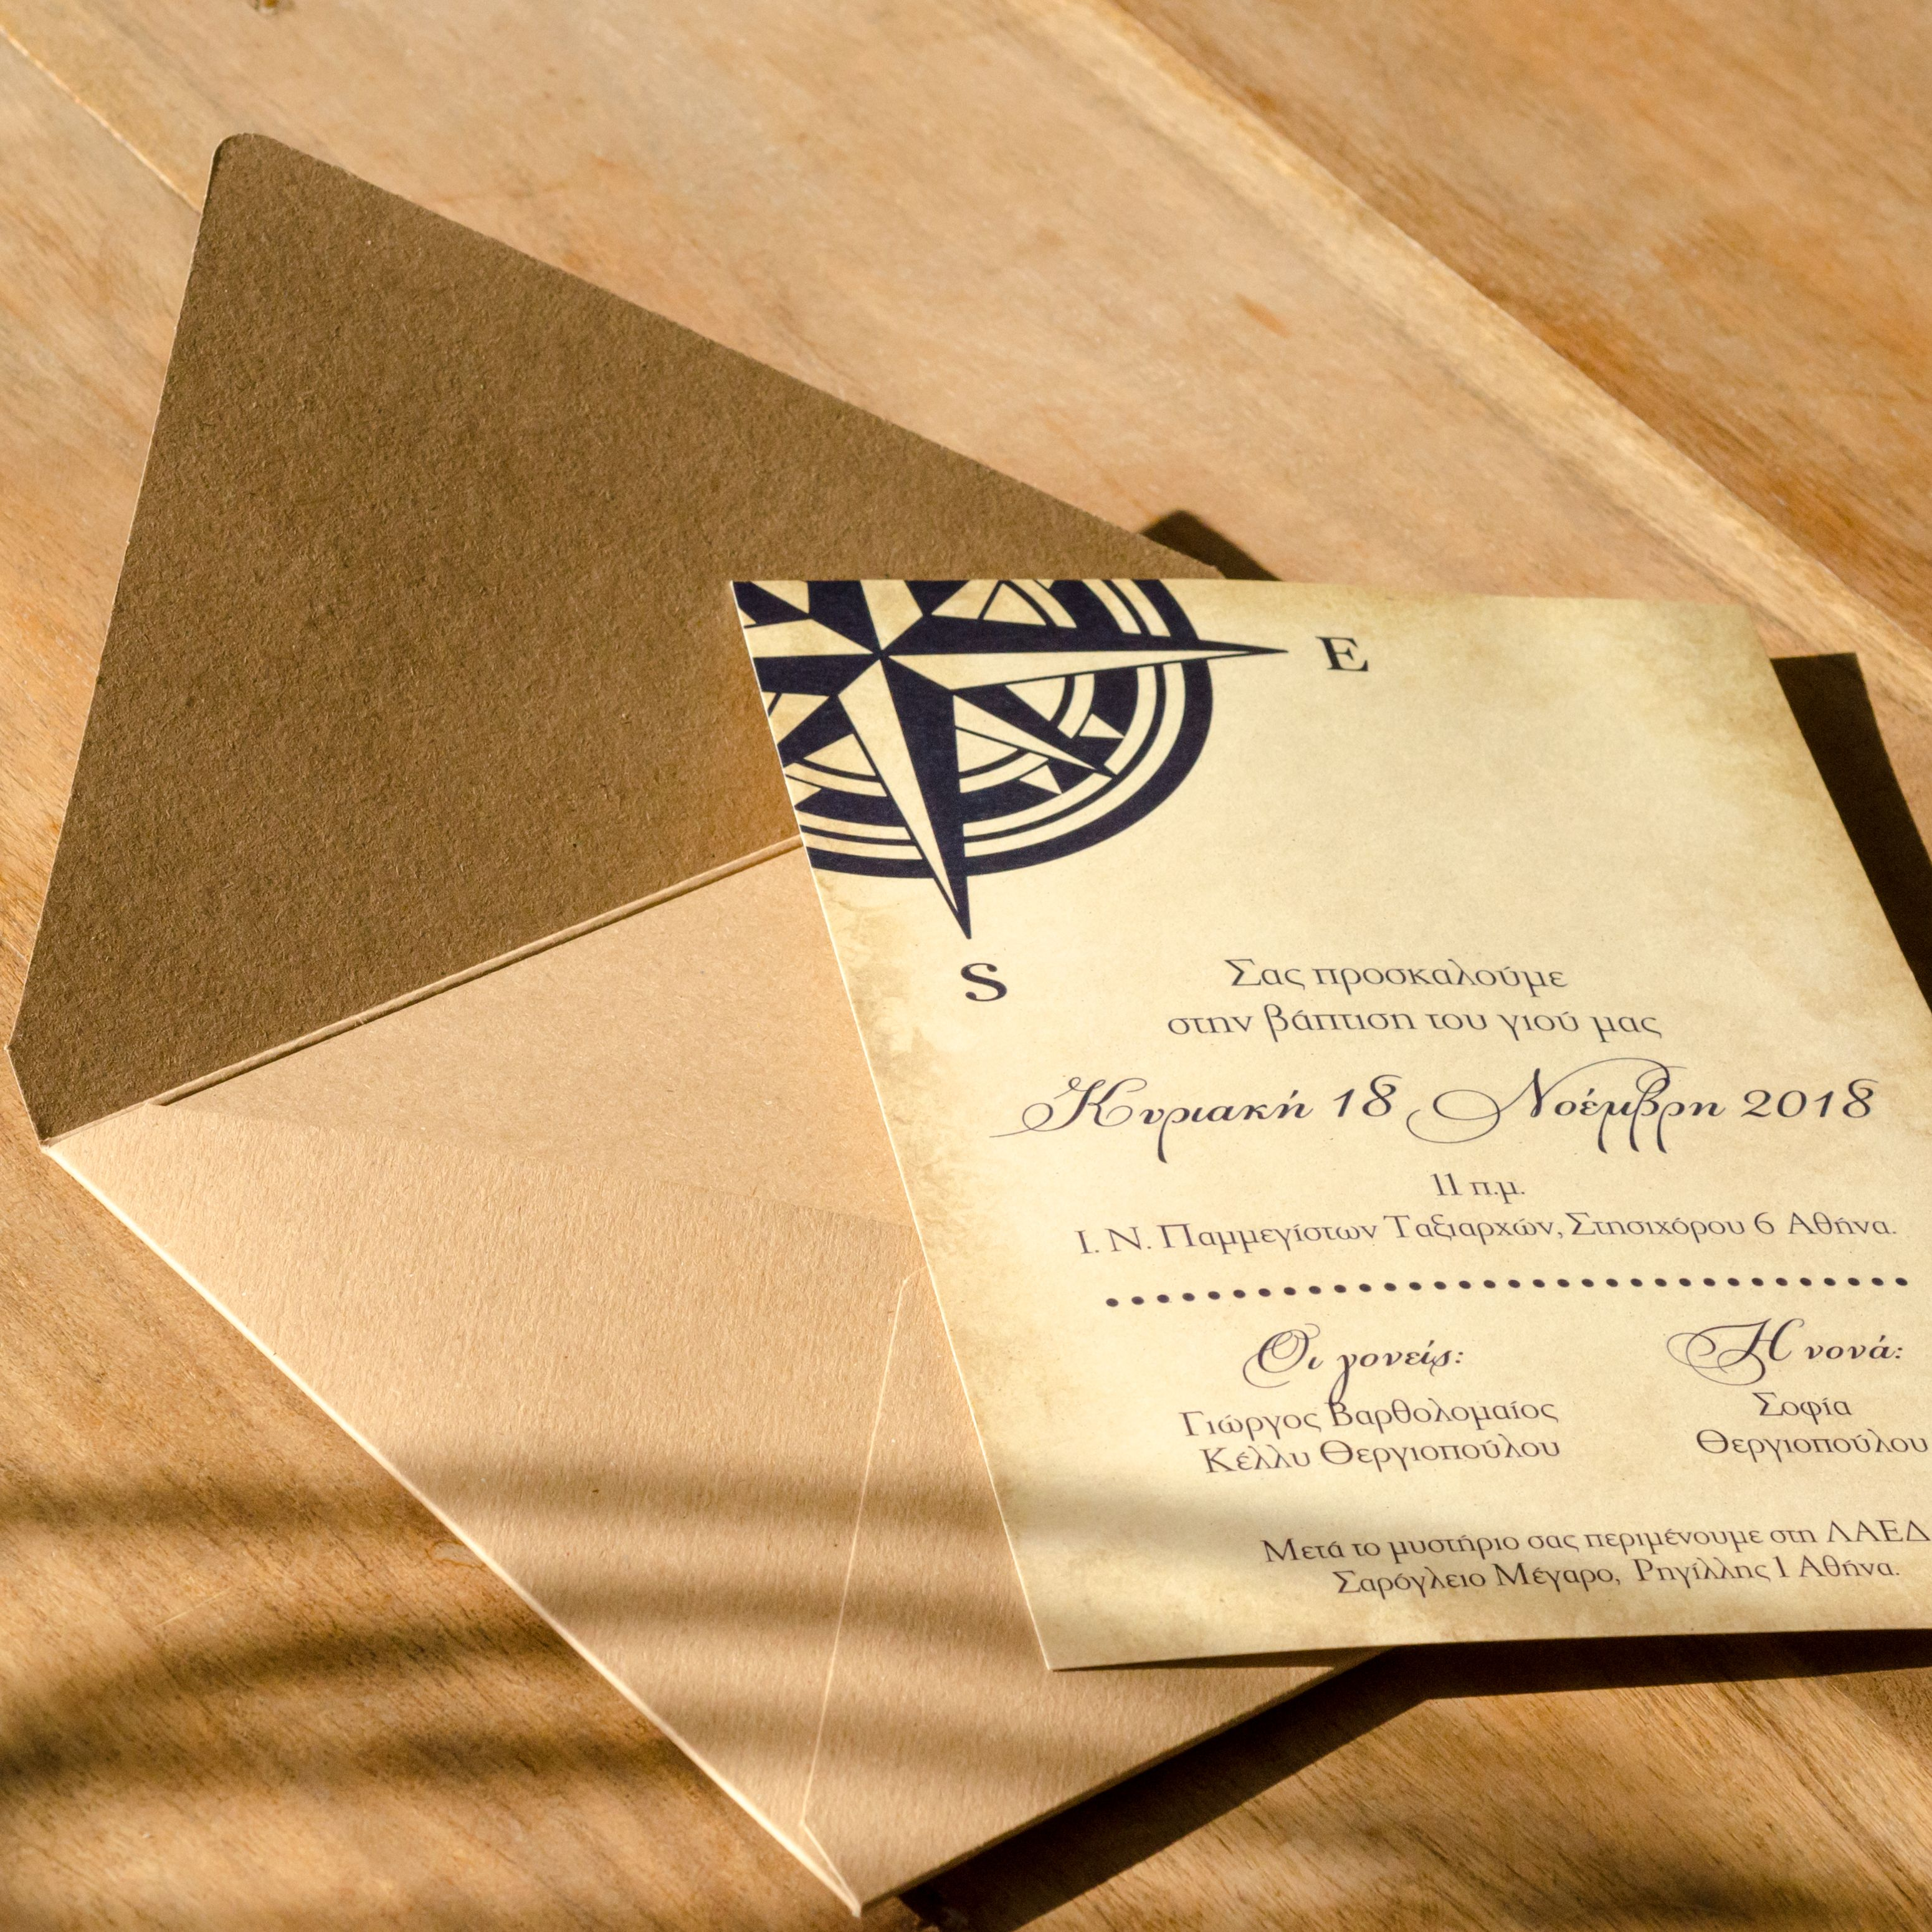 f10661ceec17 Προσκλητήριο Γάμου με θέμα την πυξίδα.